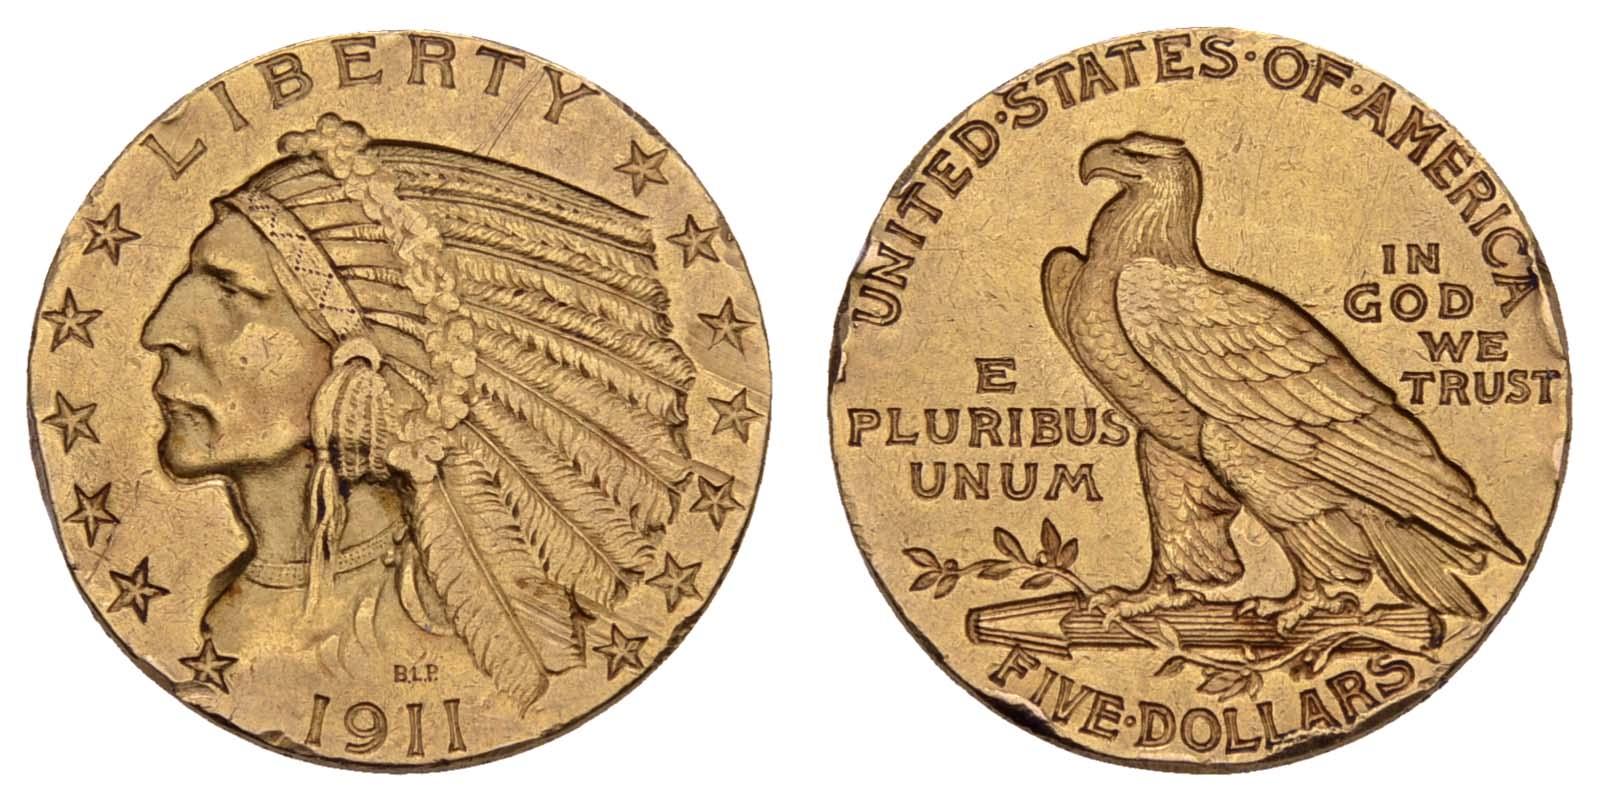 Lot 2154 - übersee usa -  Auktionshaus Ulrich Felzmann GmbH & Co. KG Coins single lots